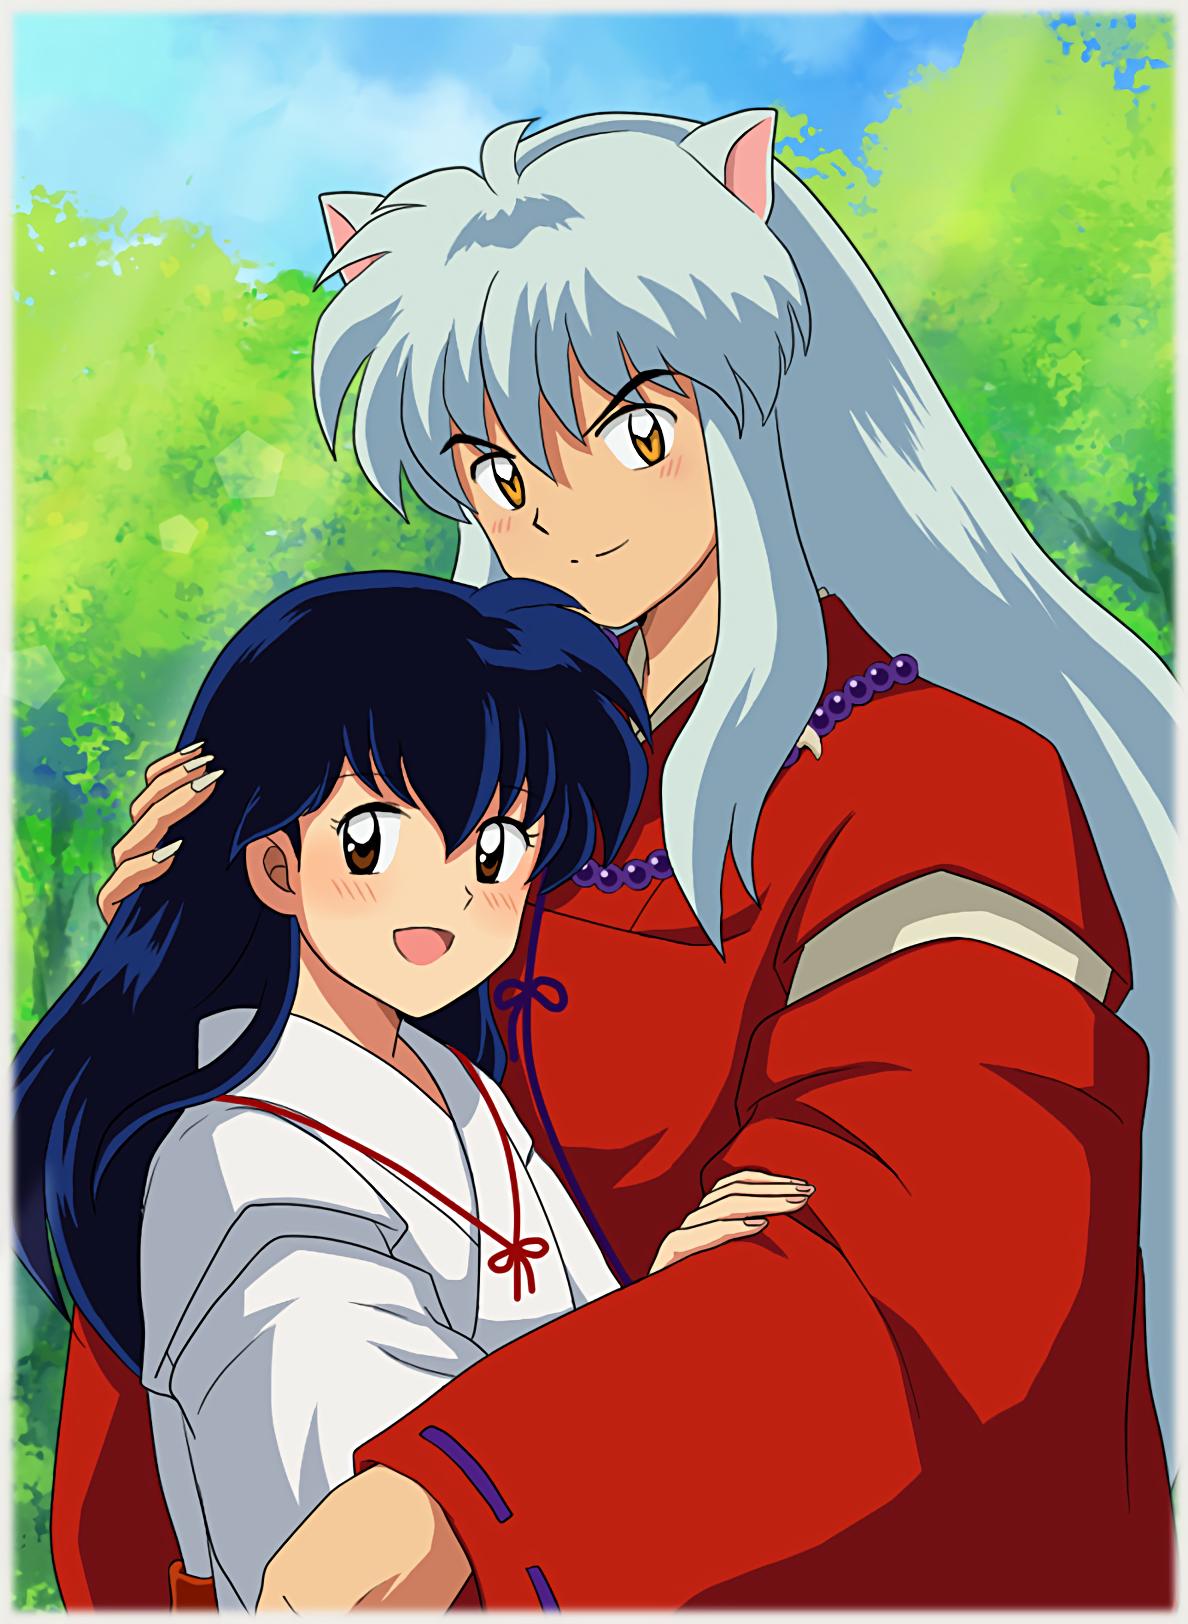 Cute Picture Of Inuyasha And Kagome Inuyasha Kagome Inuyasha